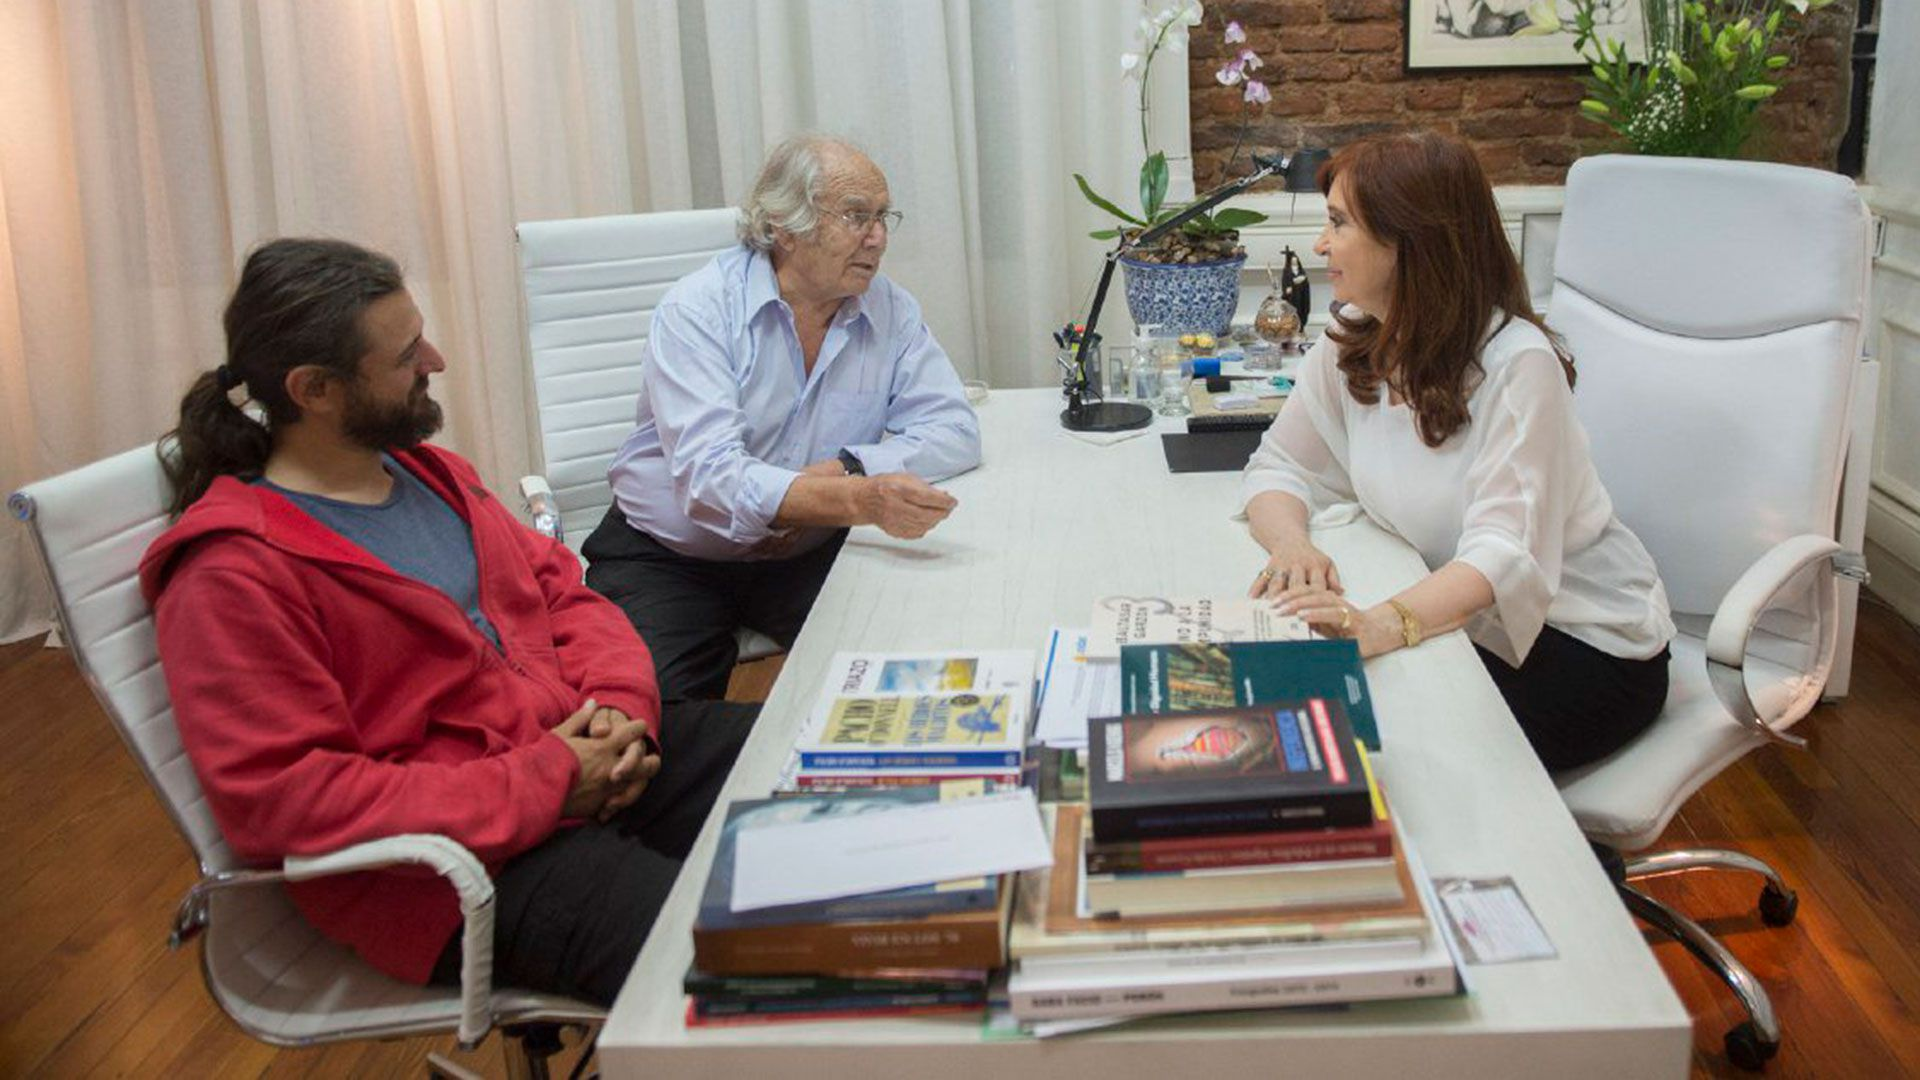 Juan Grabois, Adolfo Pérez Esquivel y Cristina Kirchner